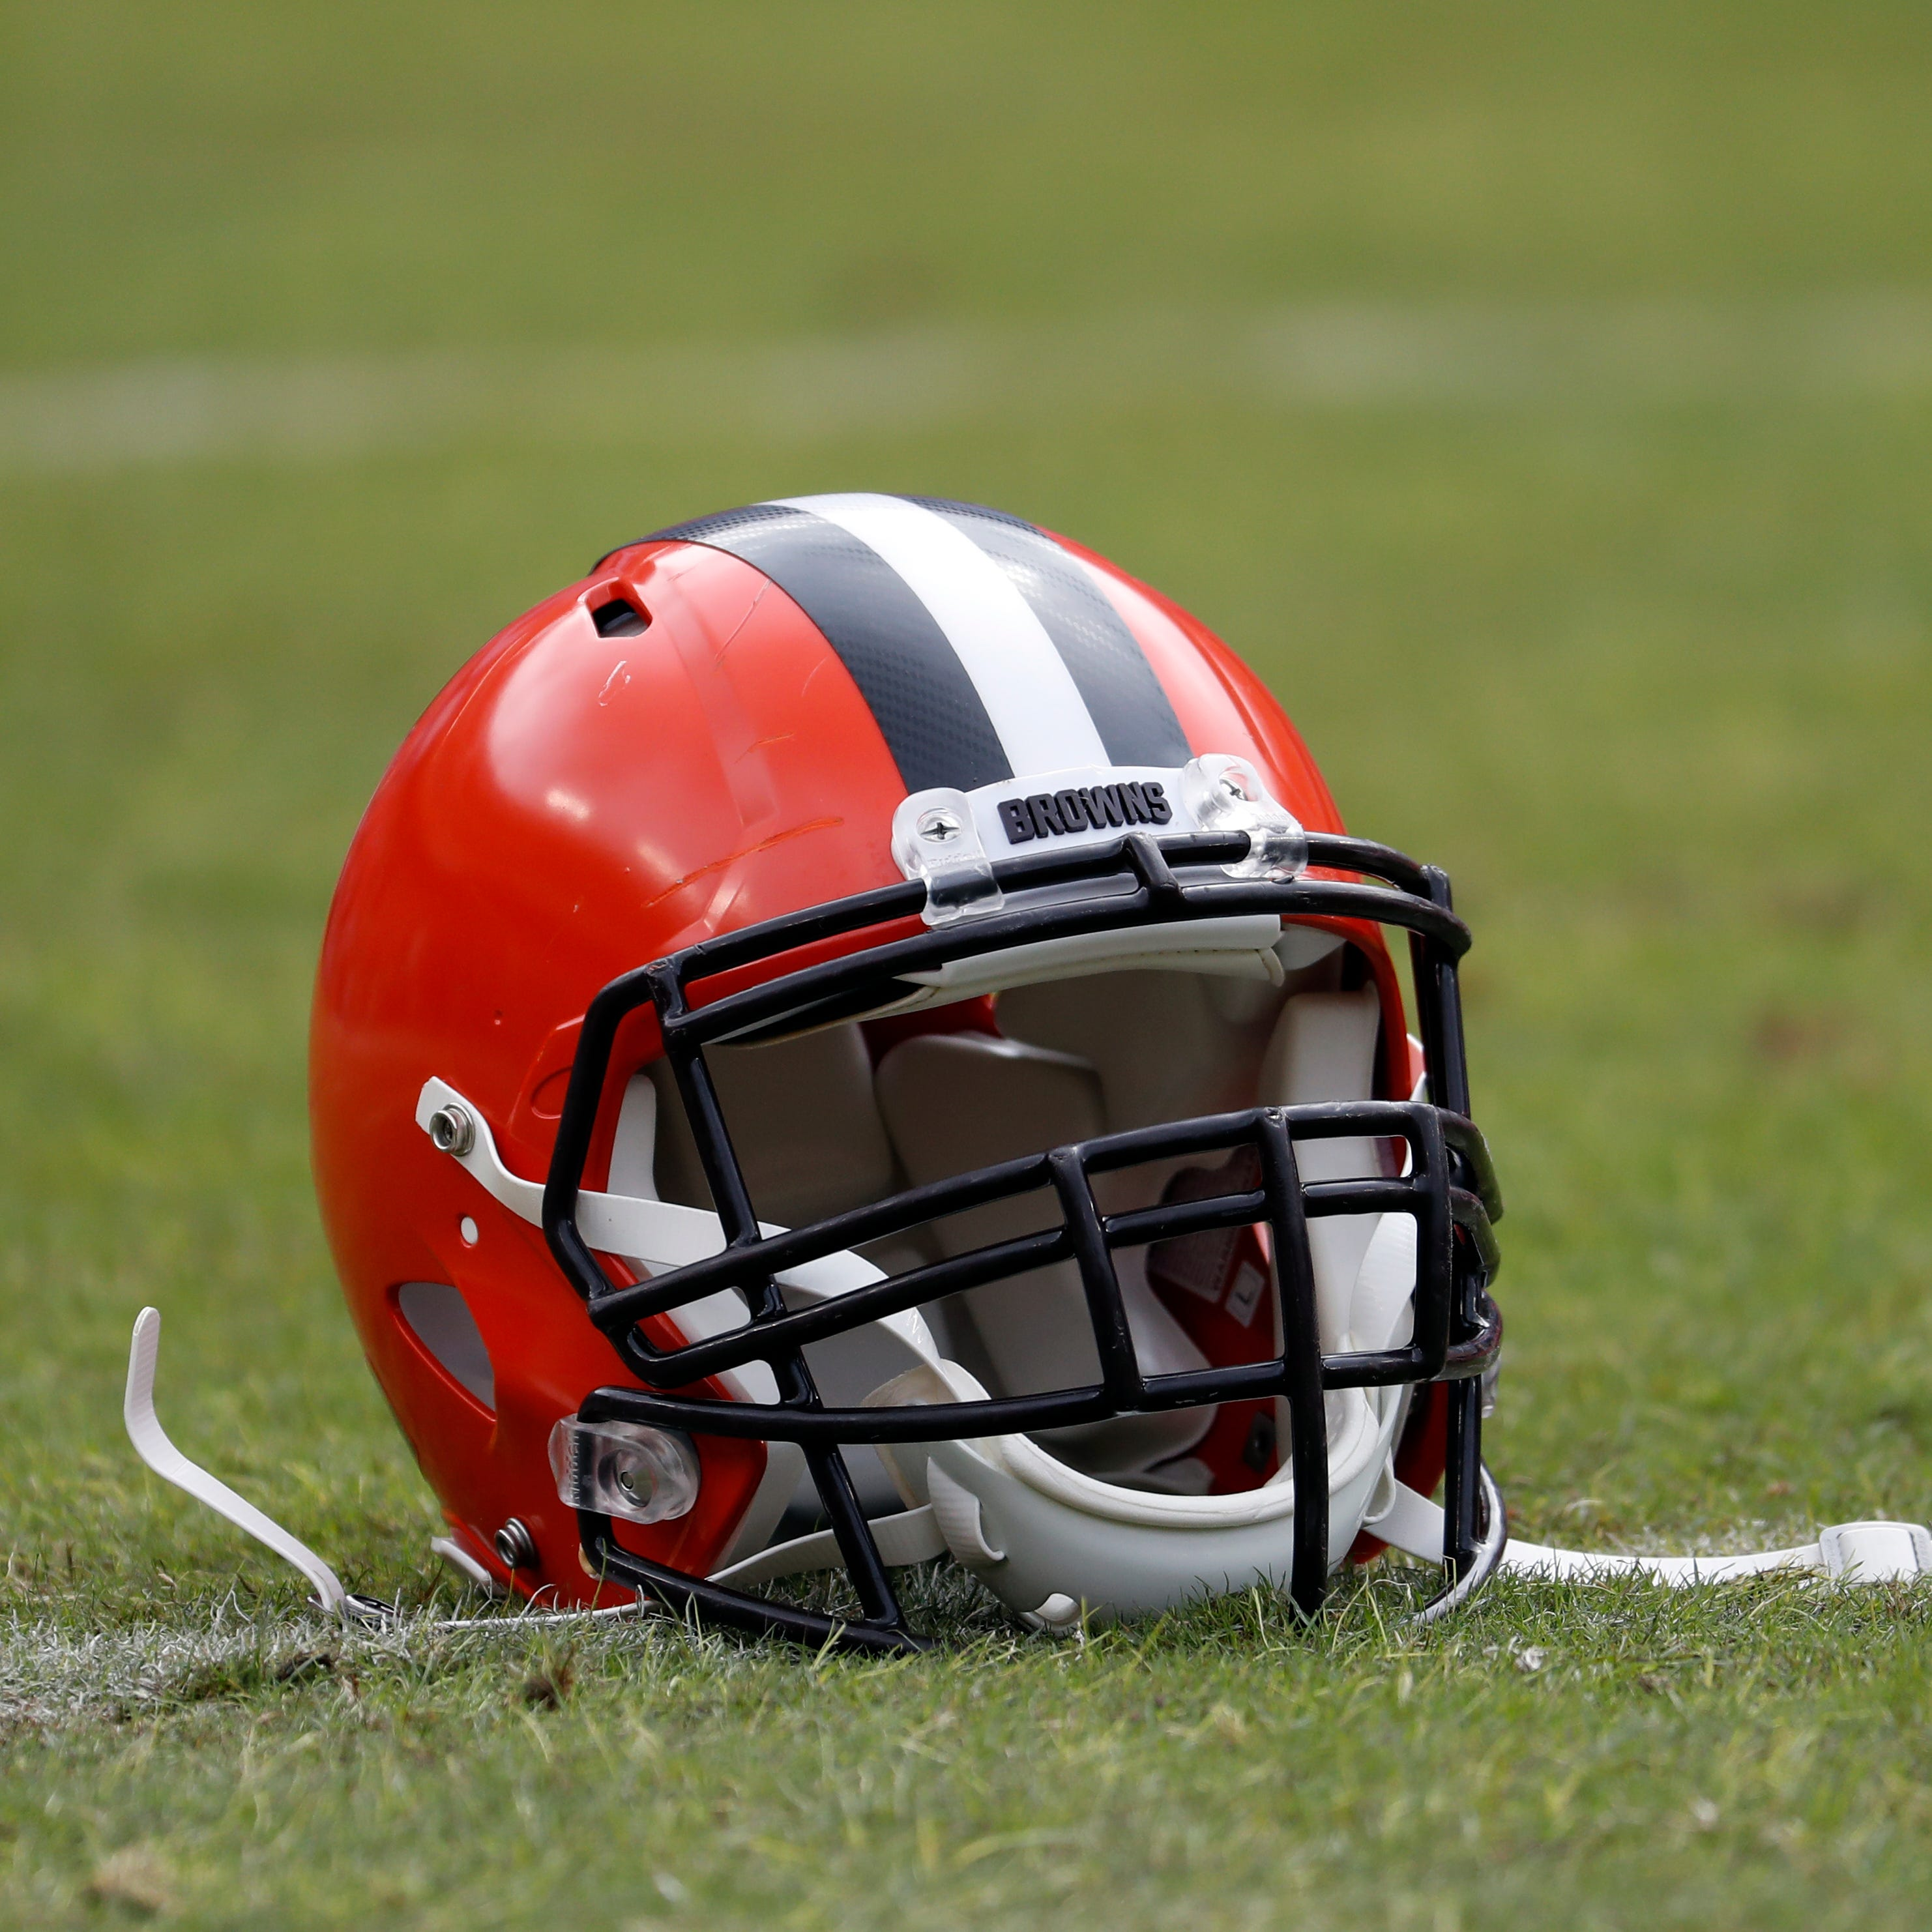 Cleveland Browns helmet.